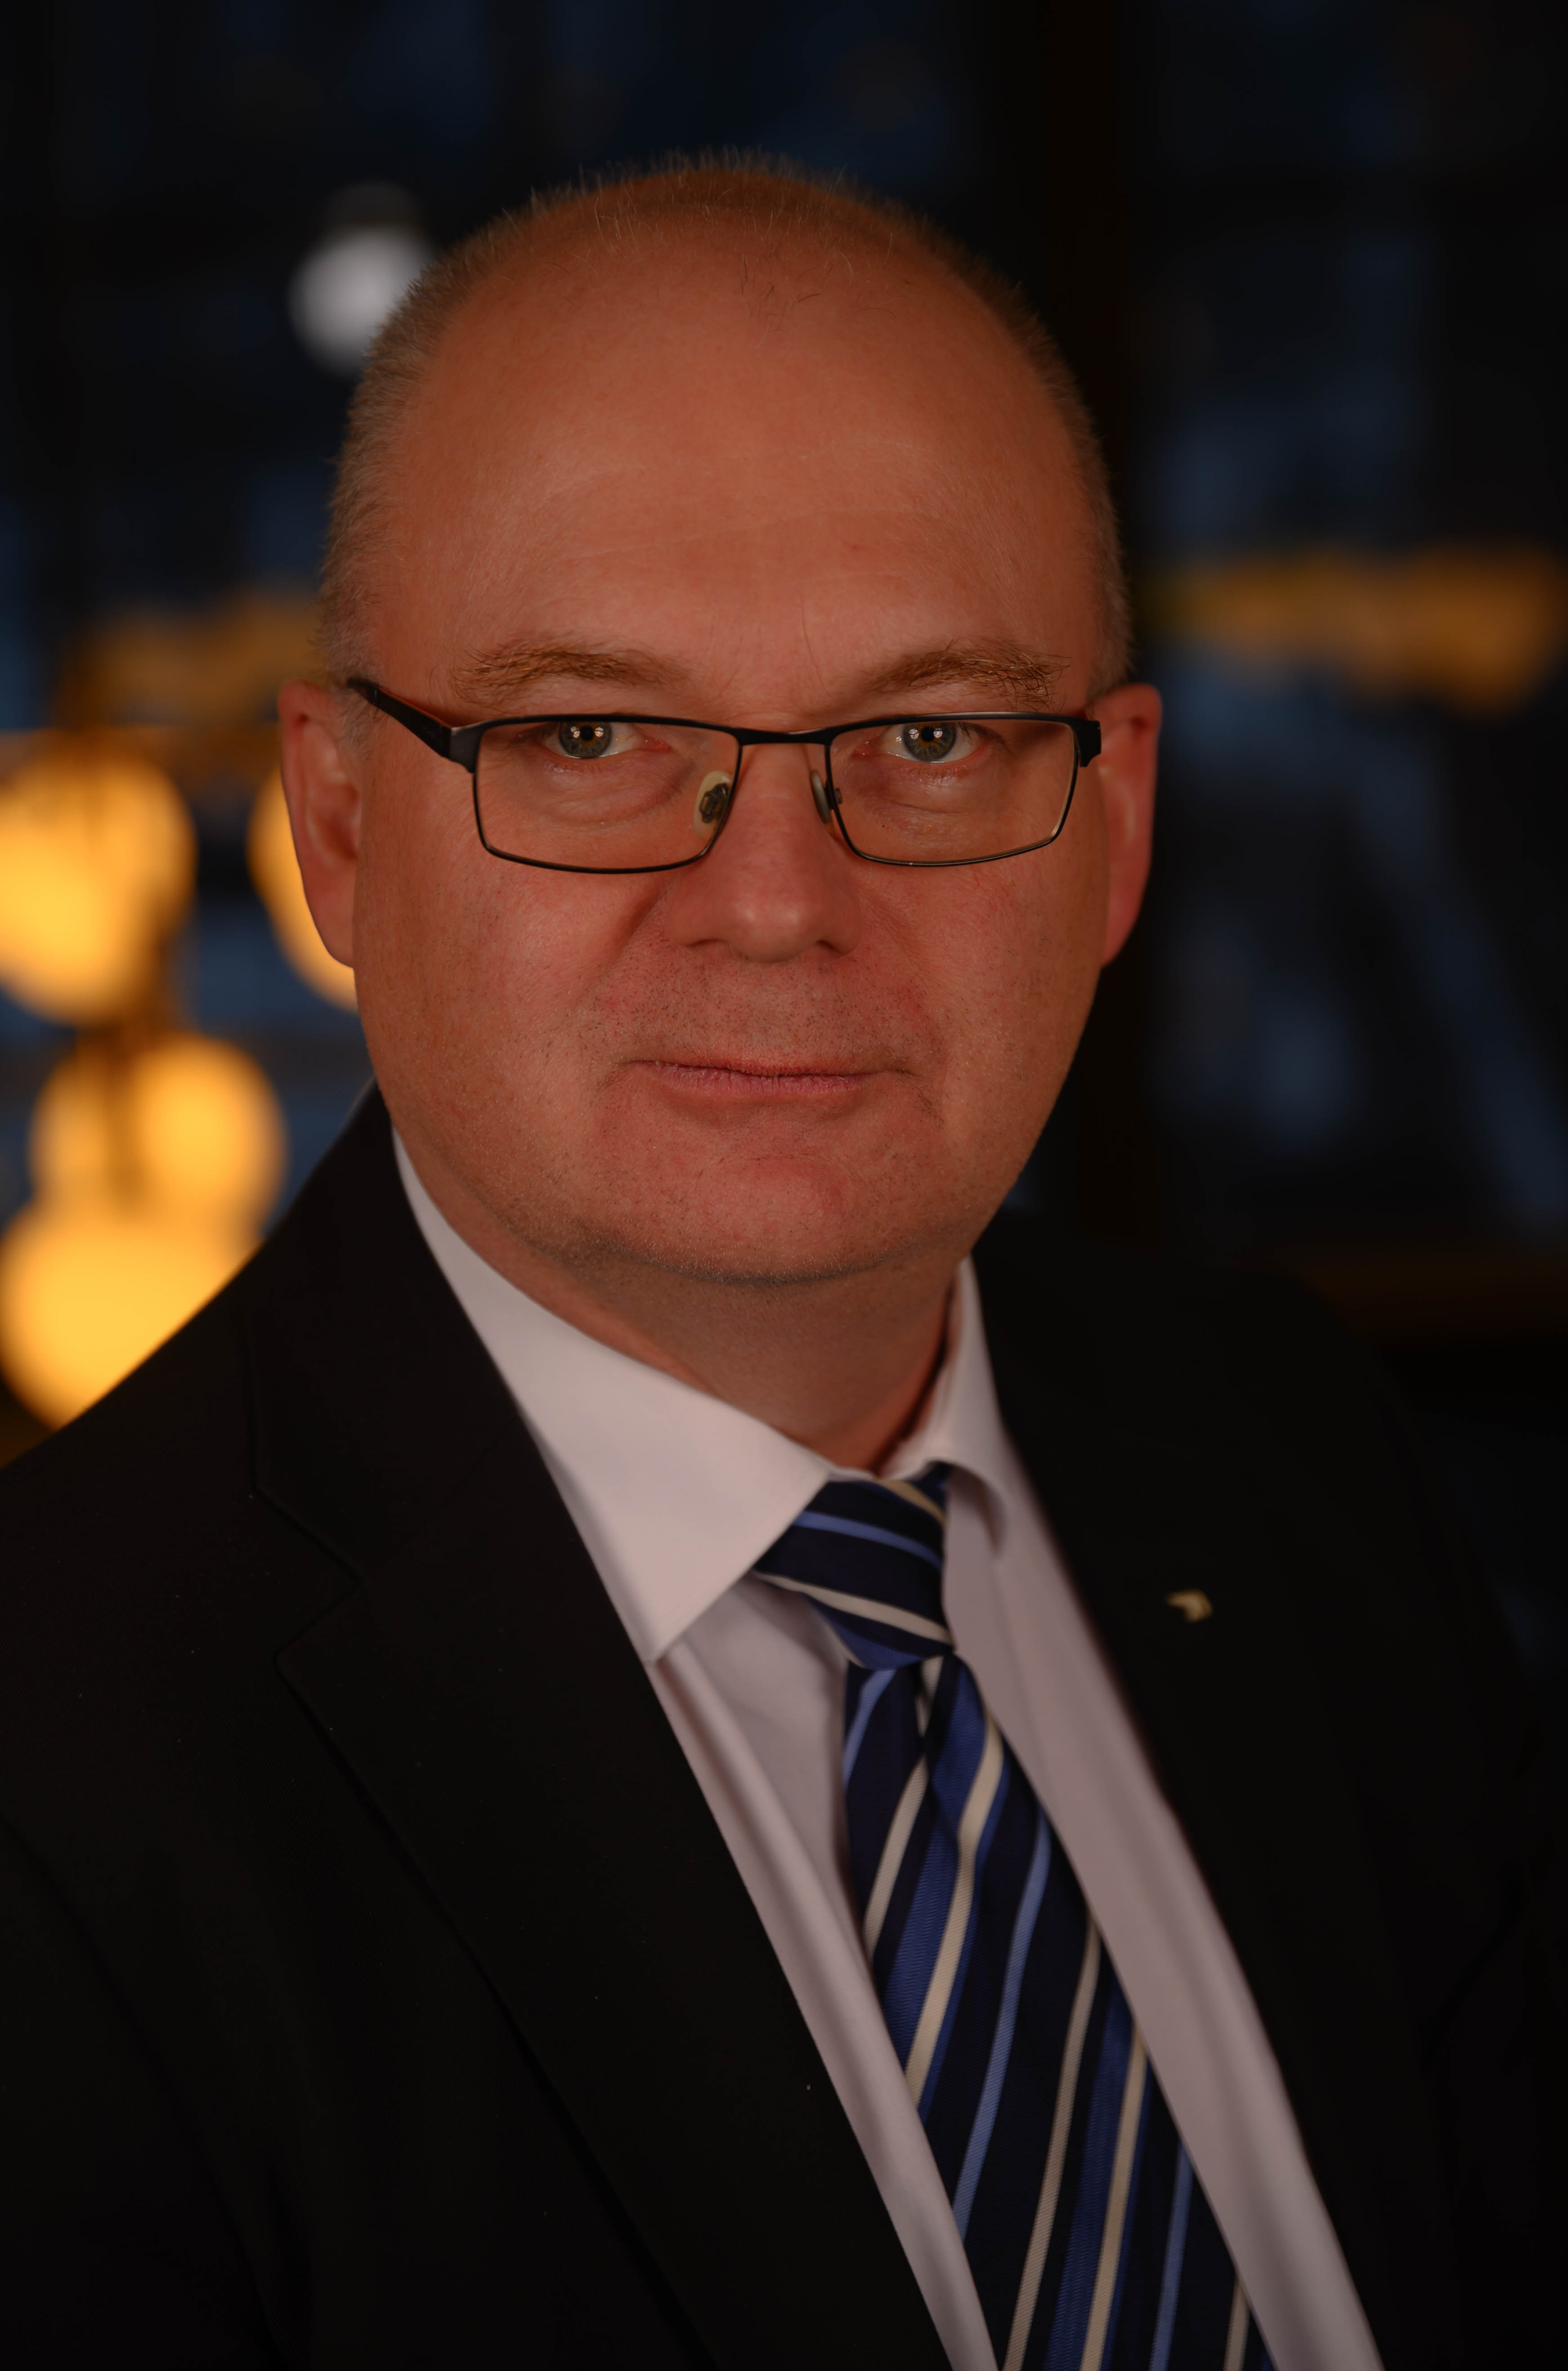 Rådmann Erlend Eriksen